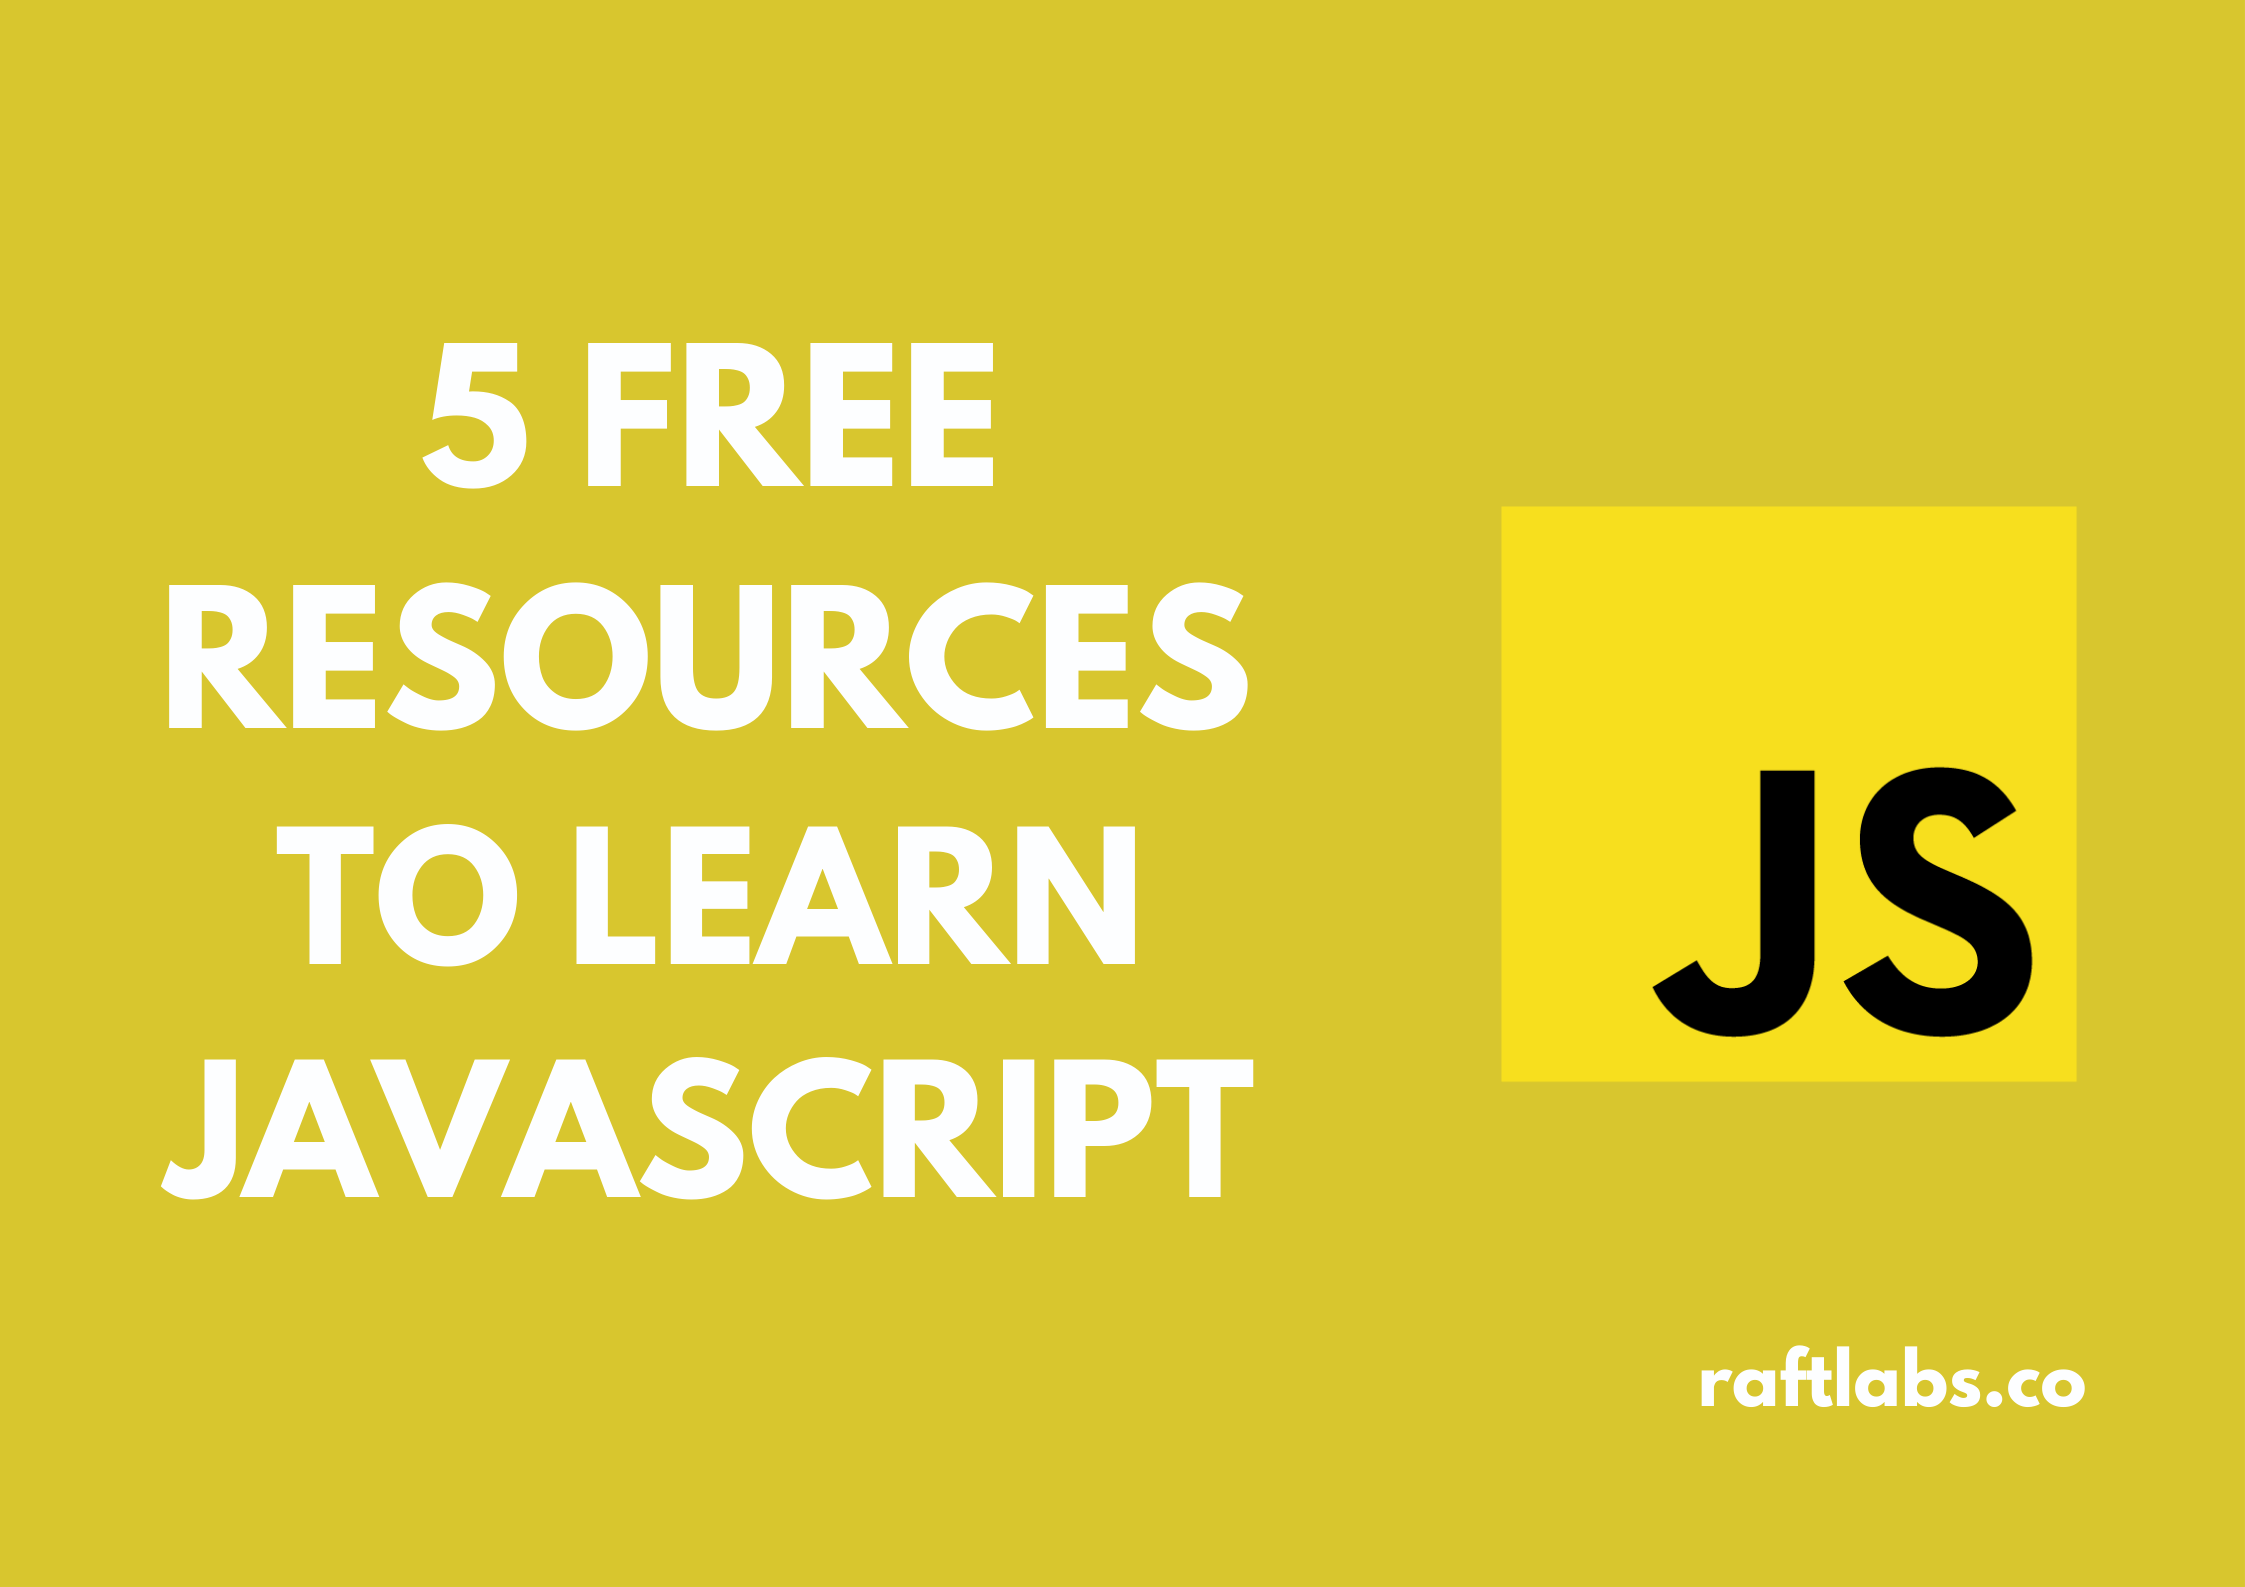 Thumbnail of Javascript